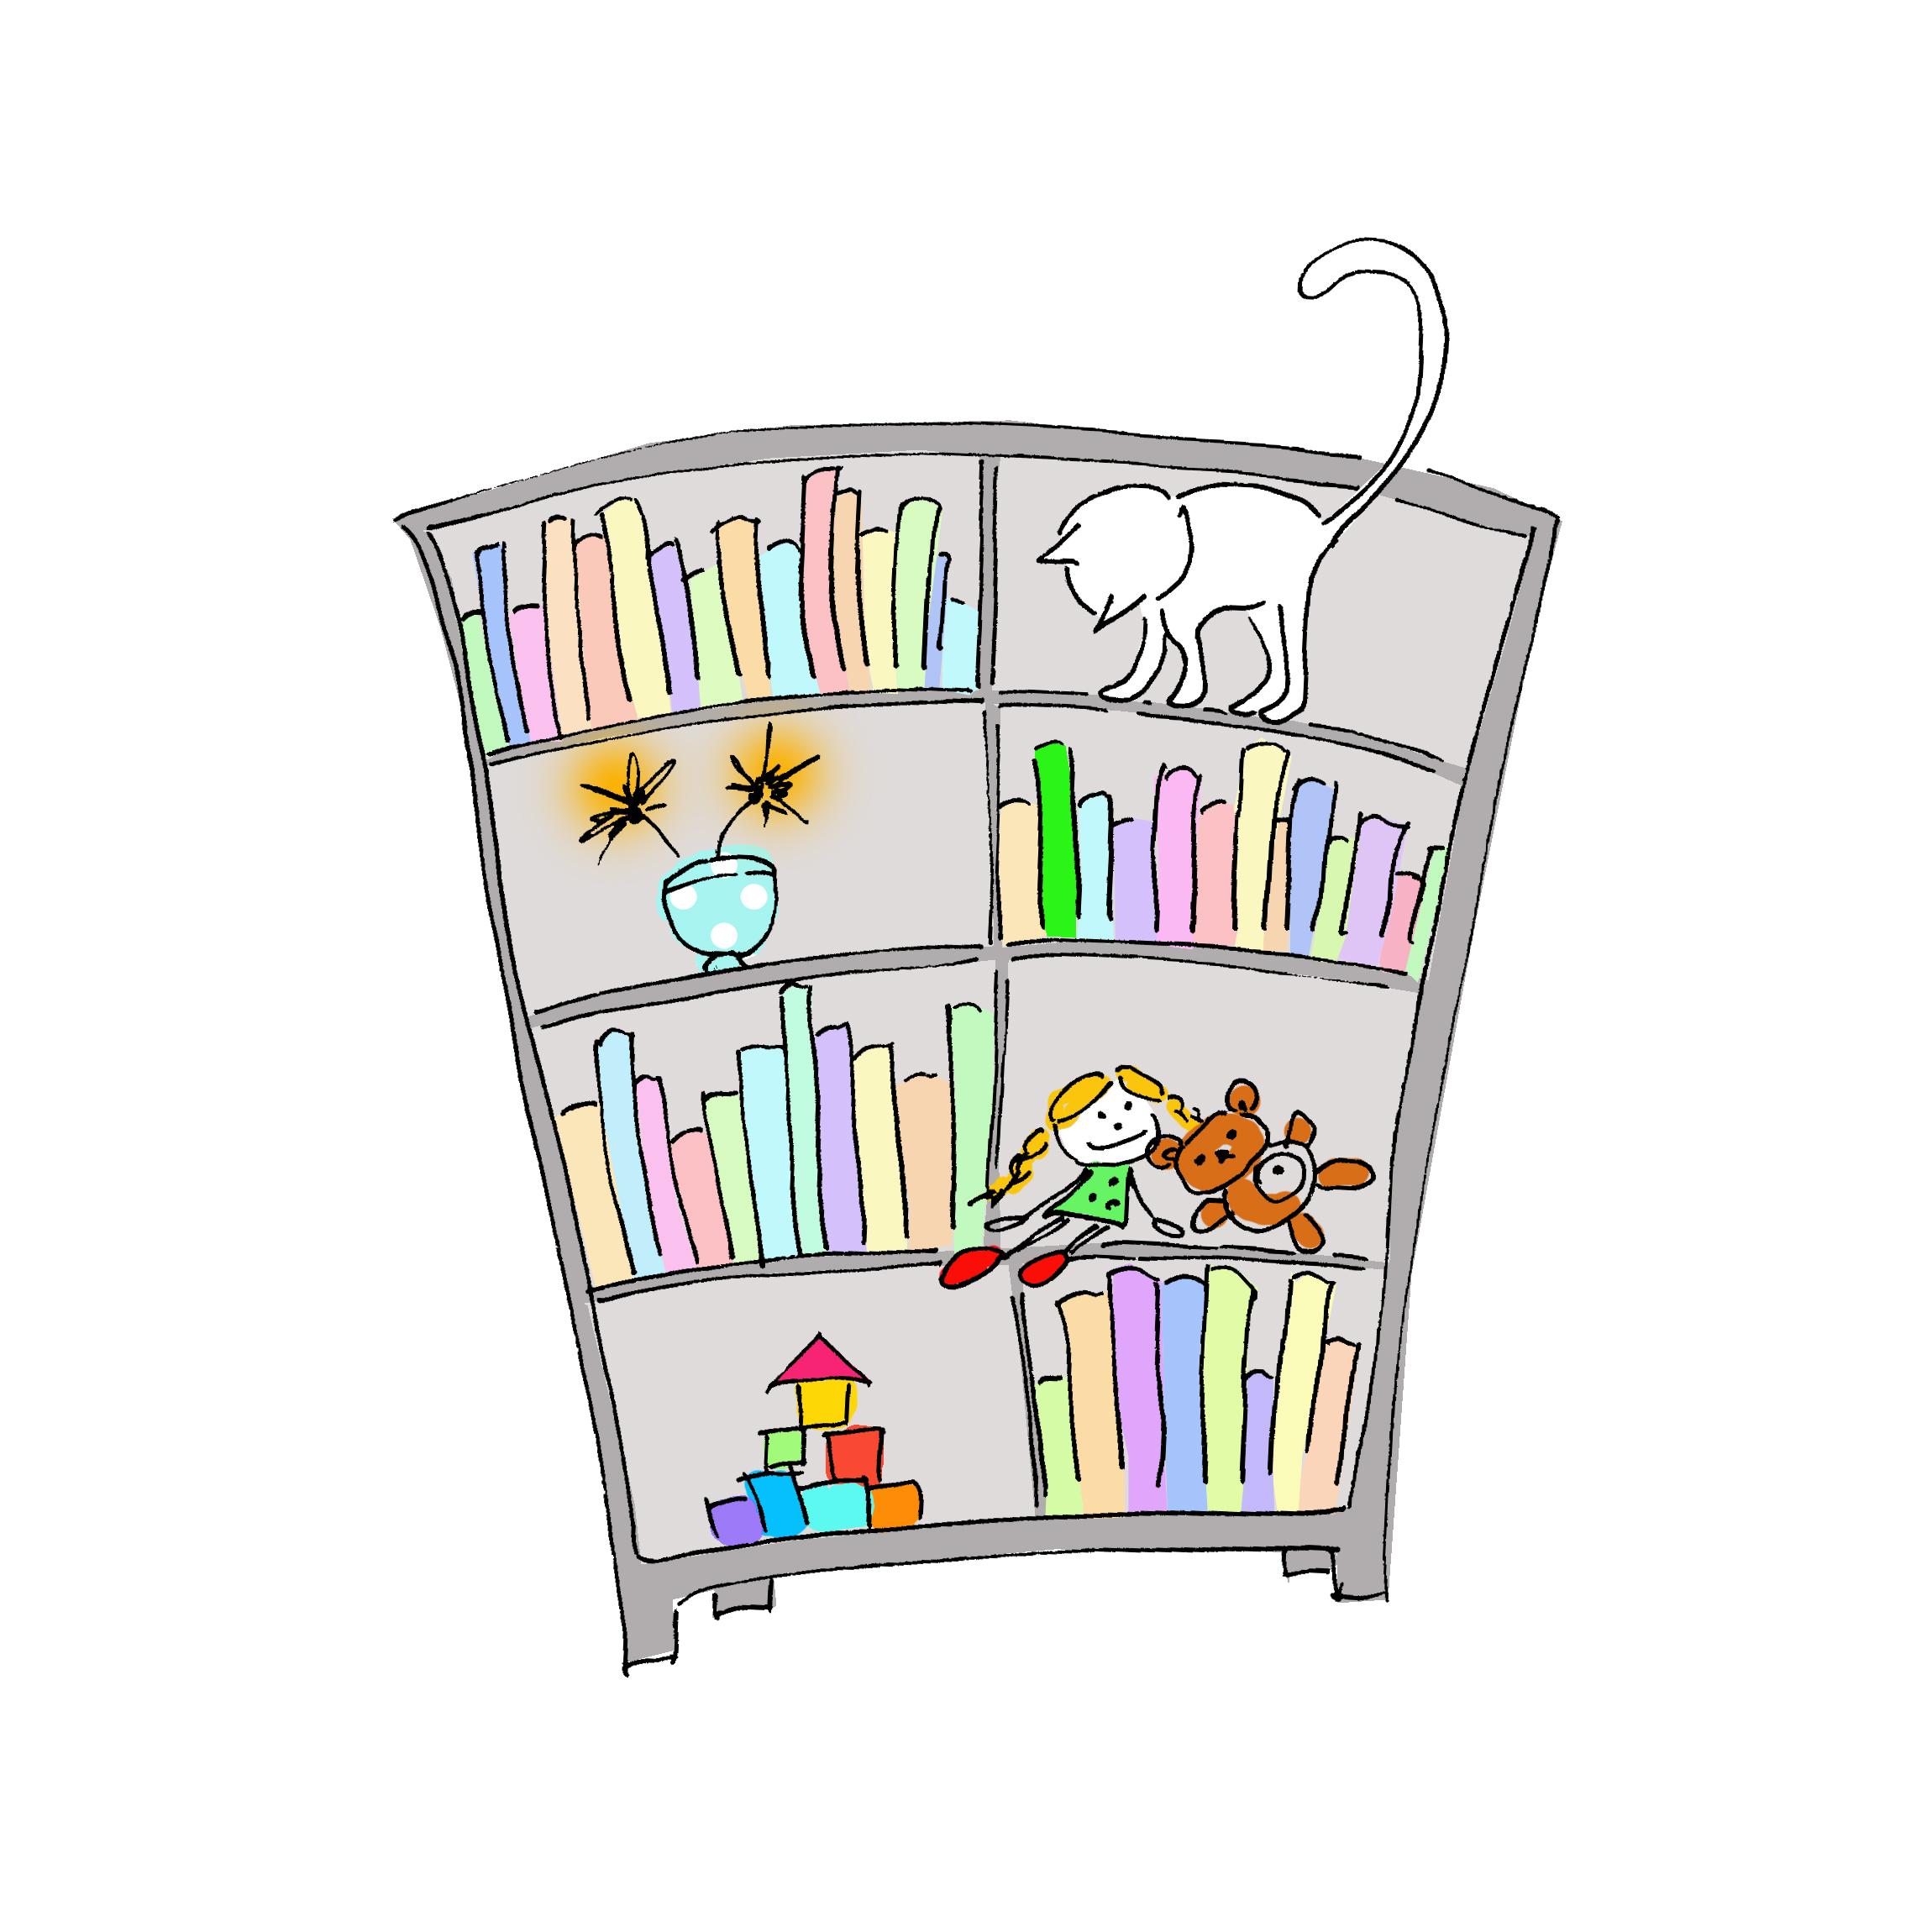 Мими&Китти – 5 – Киттина книжка by Irena Brodeski - Illustrated by Irena Brodeski - Ourboox.com